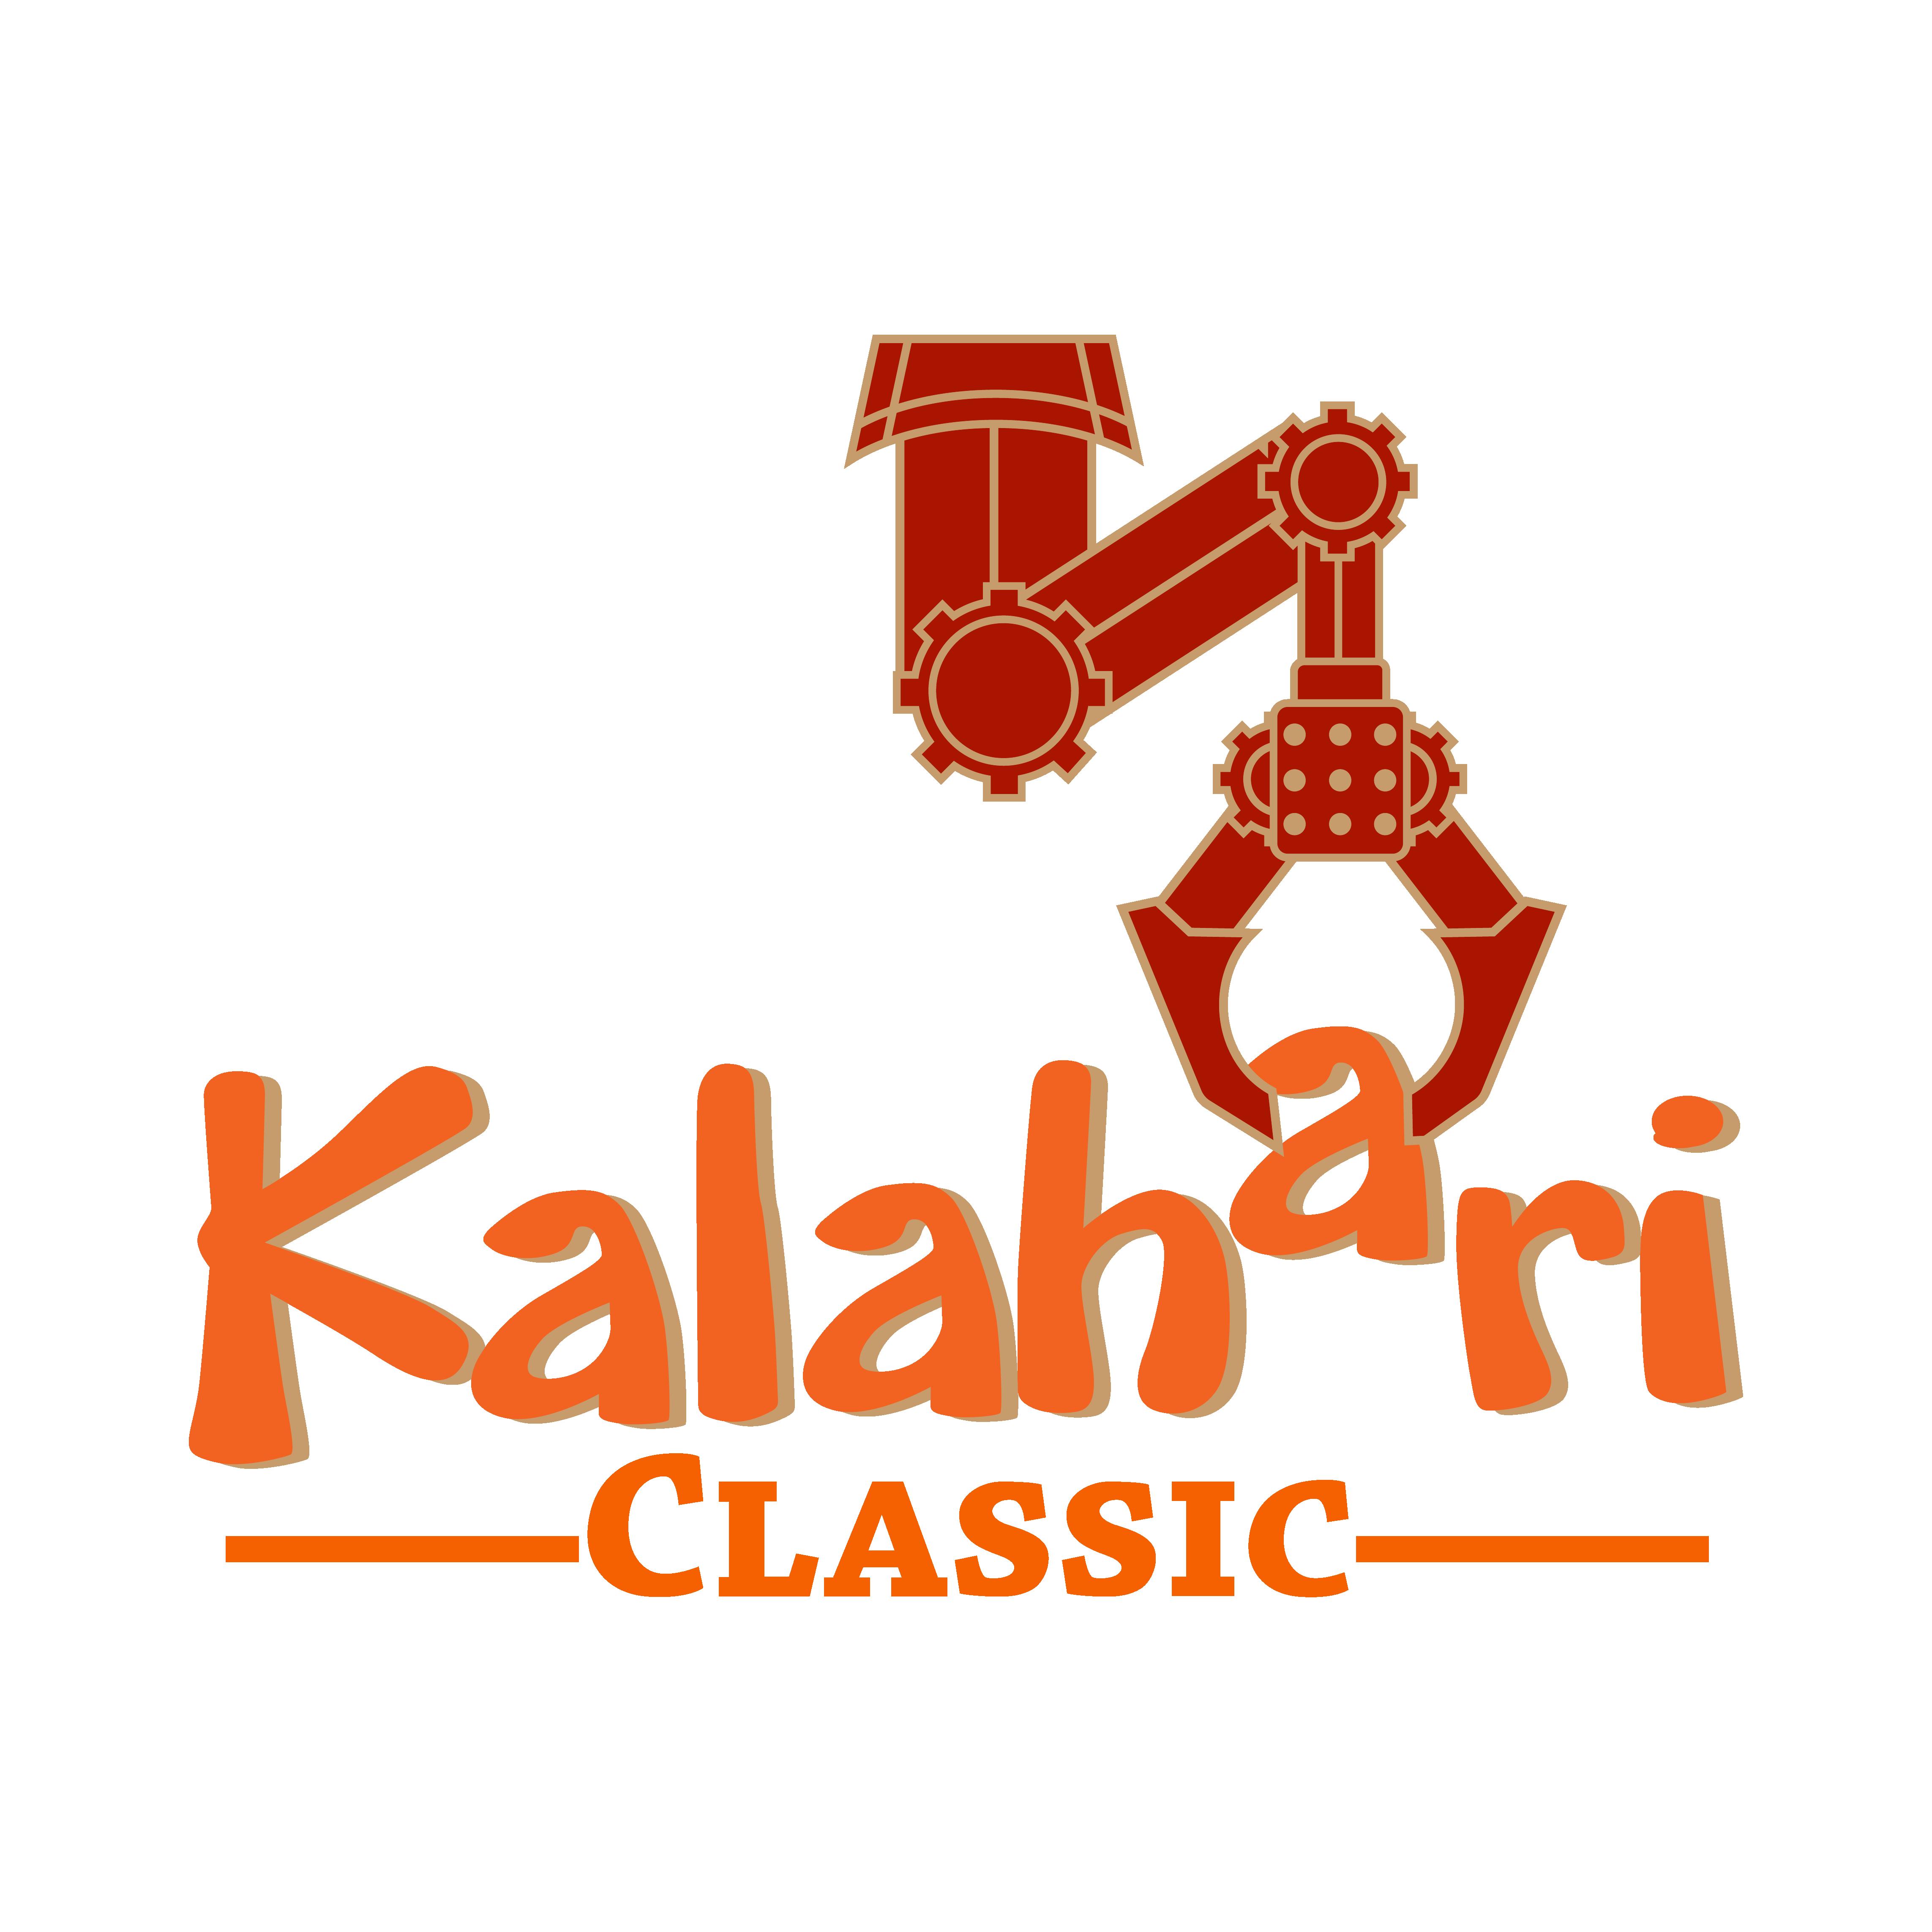 KALAHARI CLASSIC INDOOR WATERPARK VEX VRC High School Signature Event